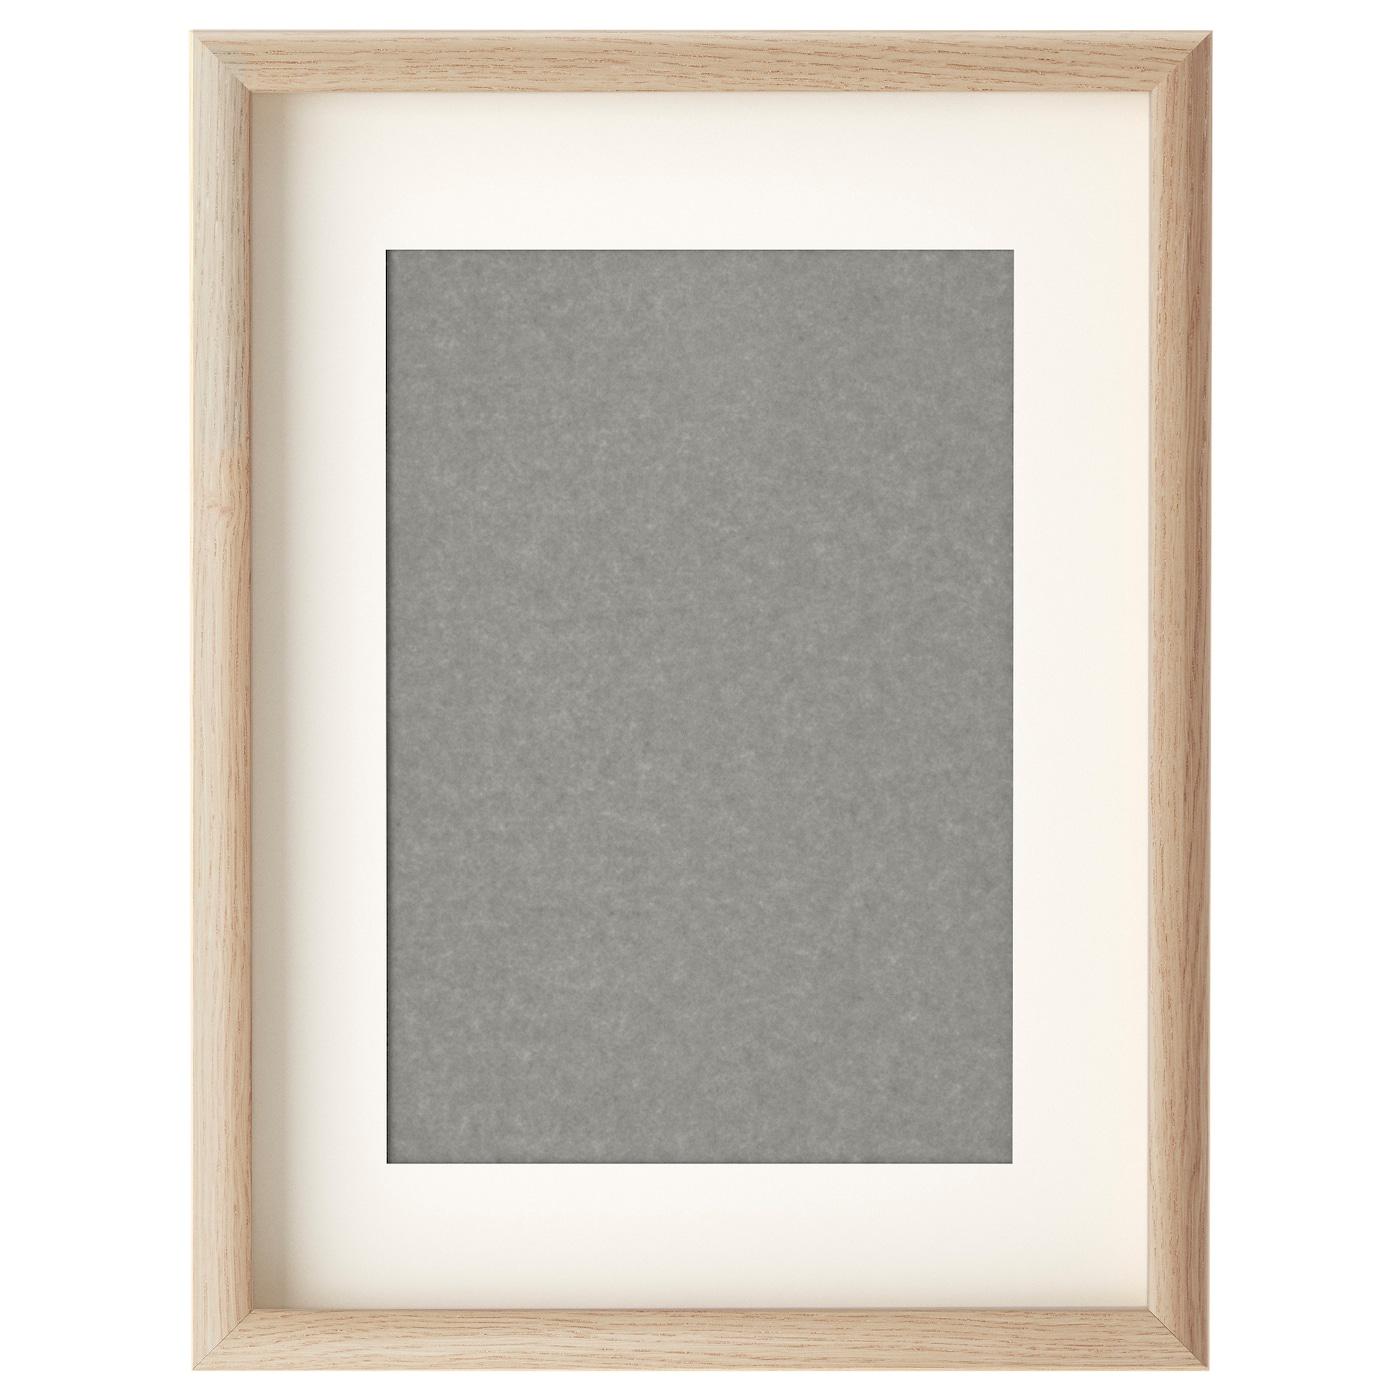 Beautiful Oak Picture Frames Ikea Component - Framed Art Ideas ...